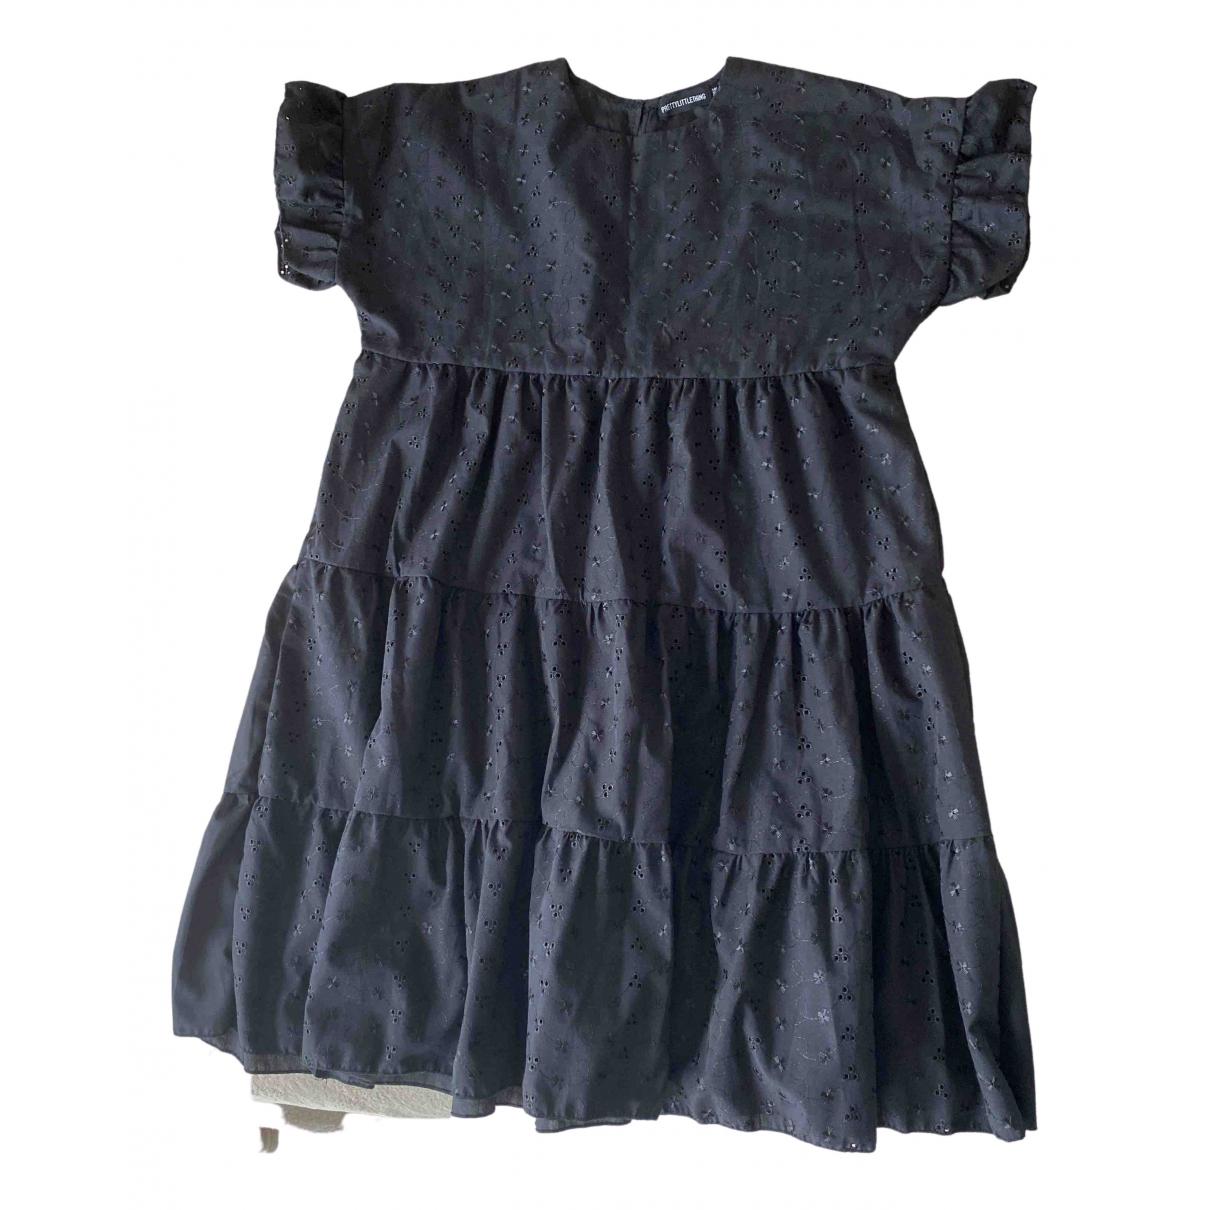 Zara \N Black Cotton dress for Women 10 UK